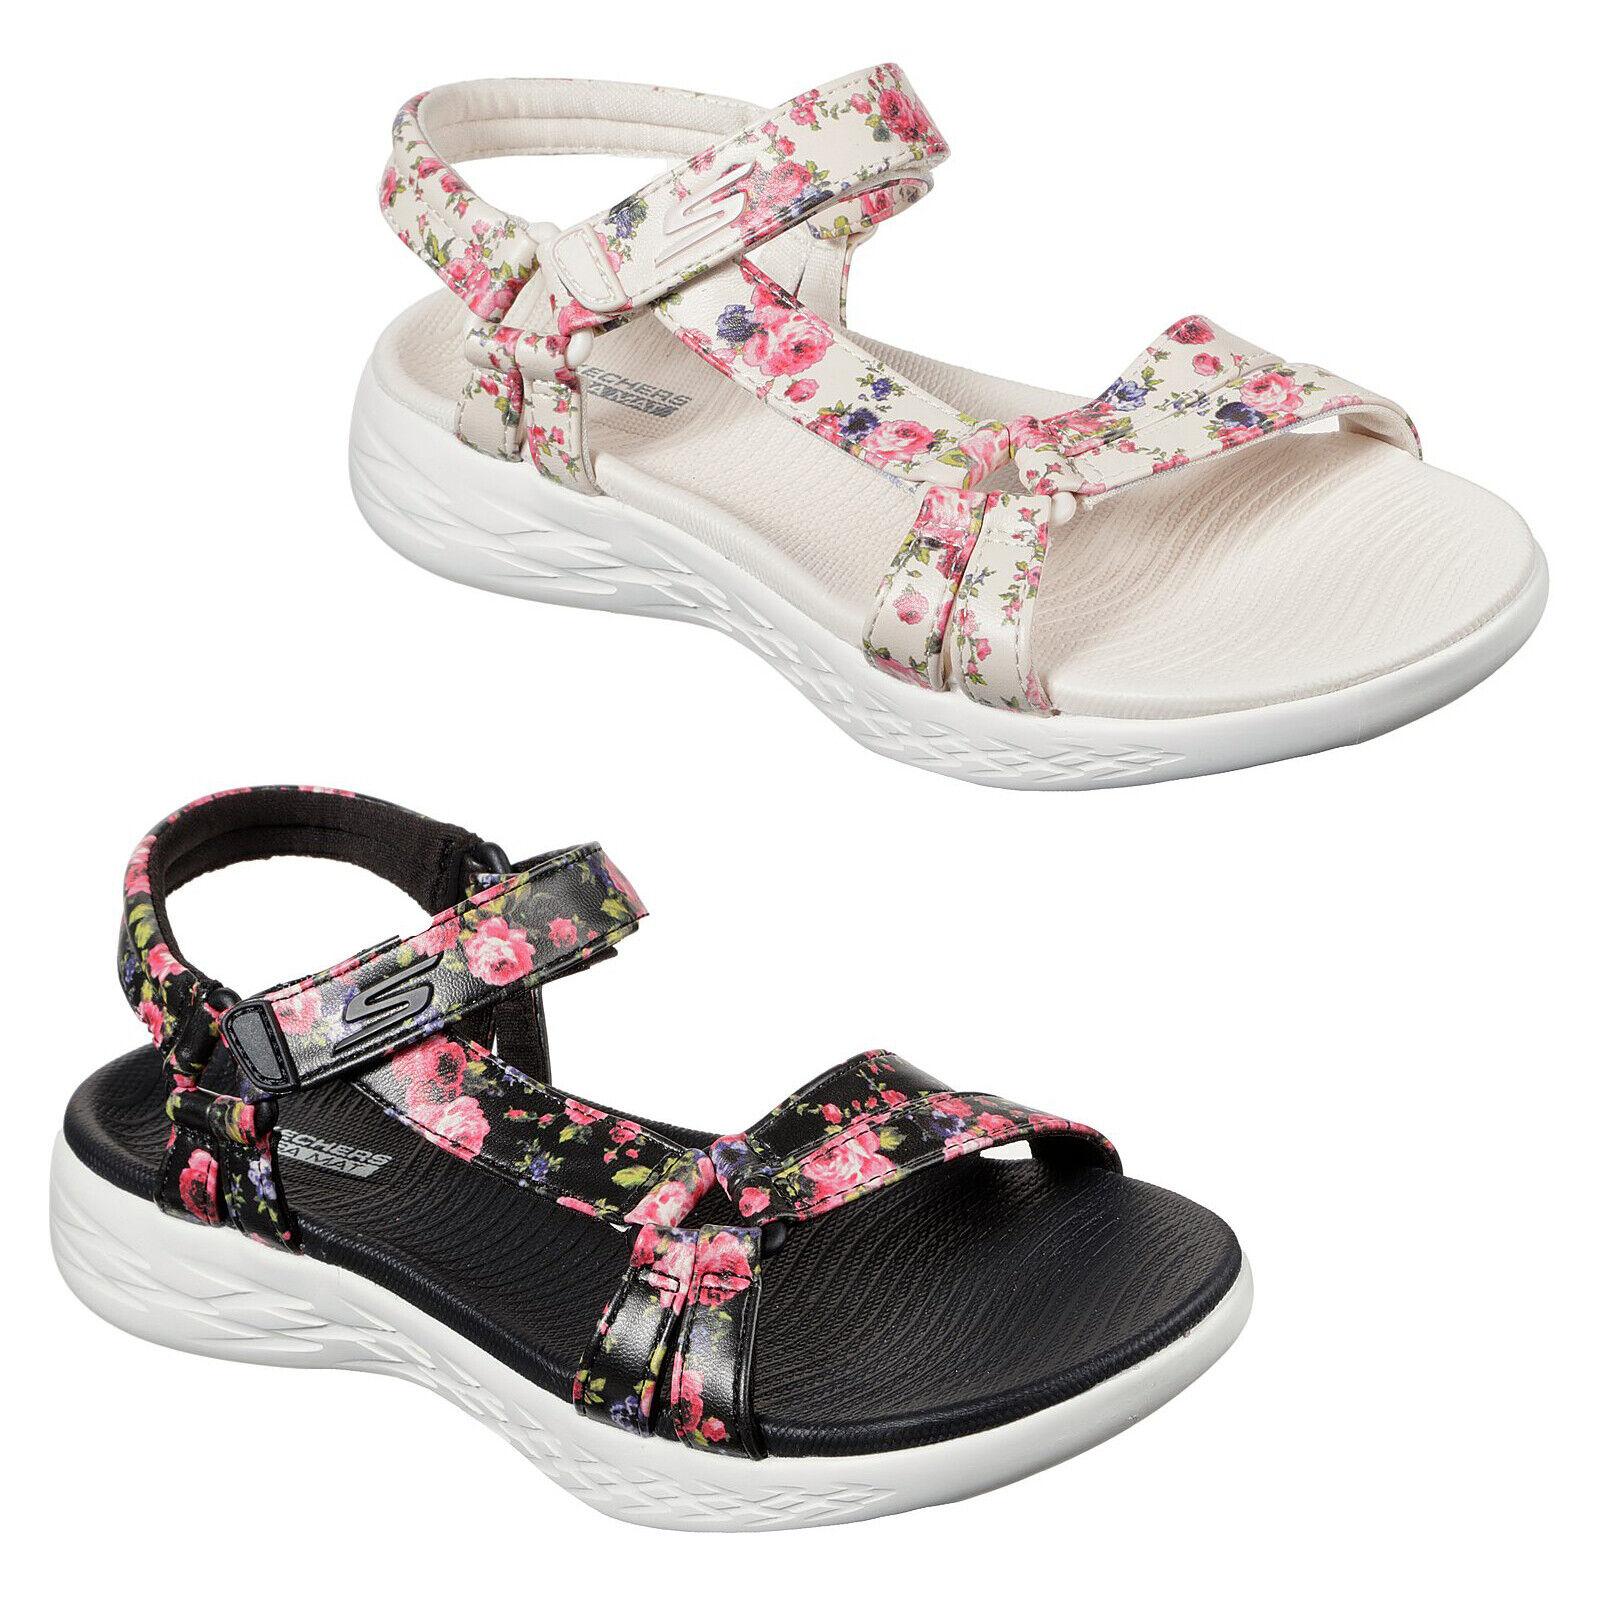 Go 600 Fleur Strap Flower Summer Shoes